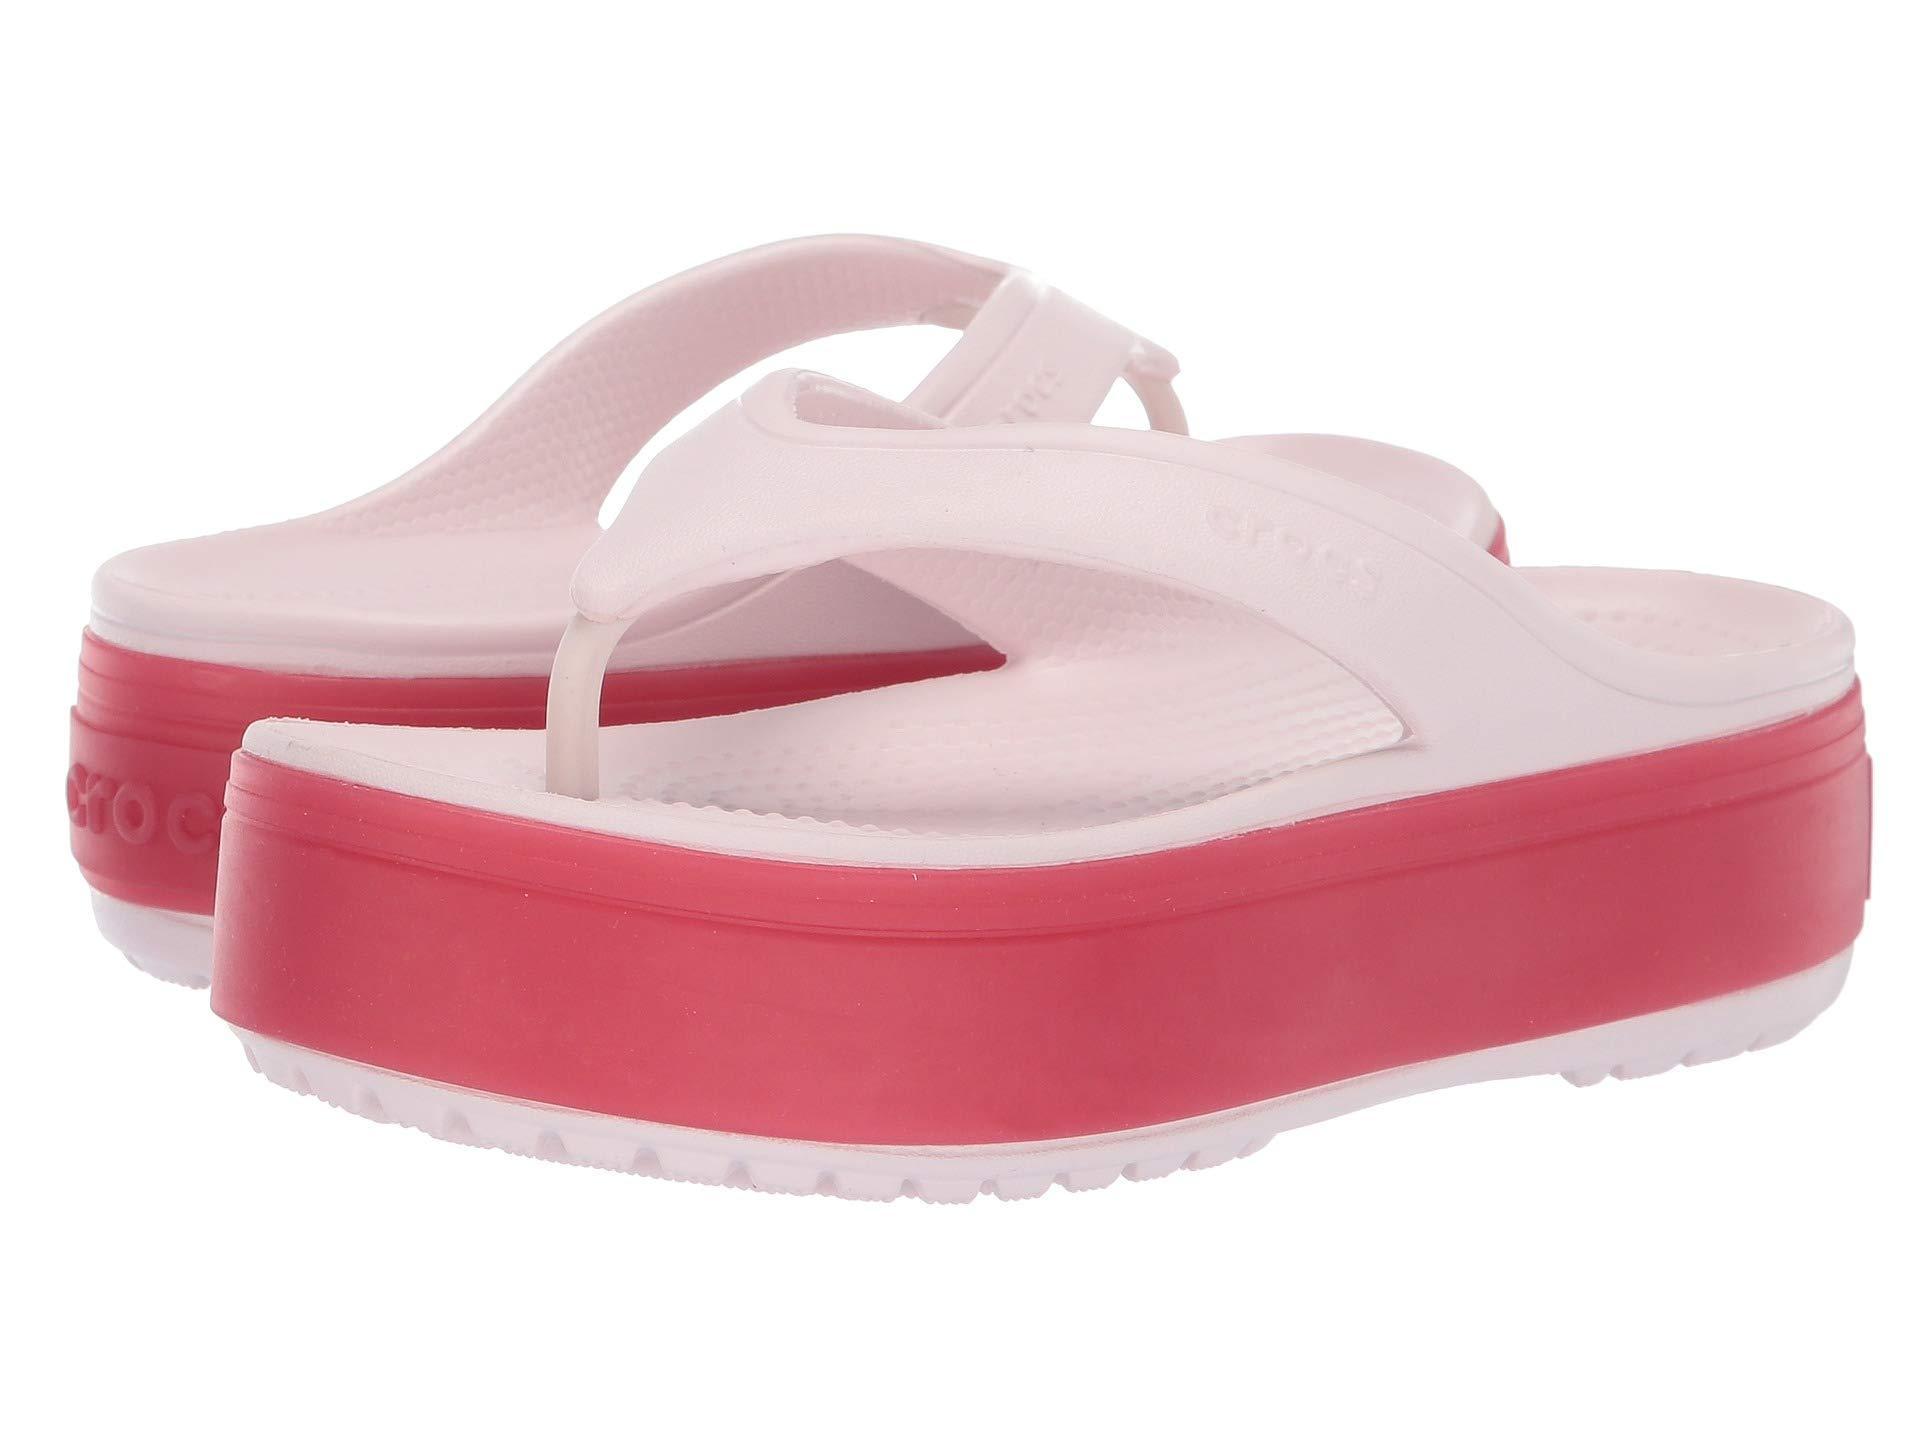 65127cba2a50 Lyst - Crocs™ Crocband Platform Flip (light Grey rose) Sandals in ...